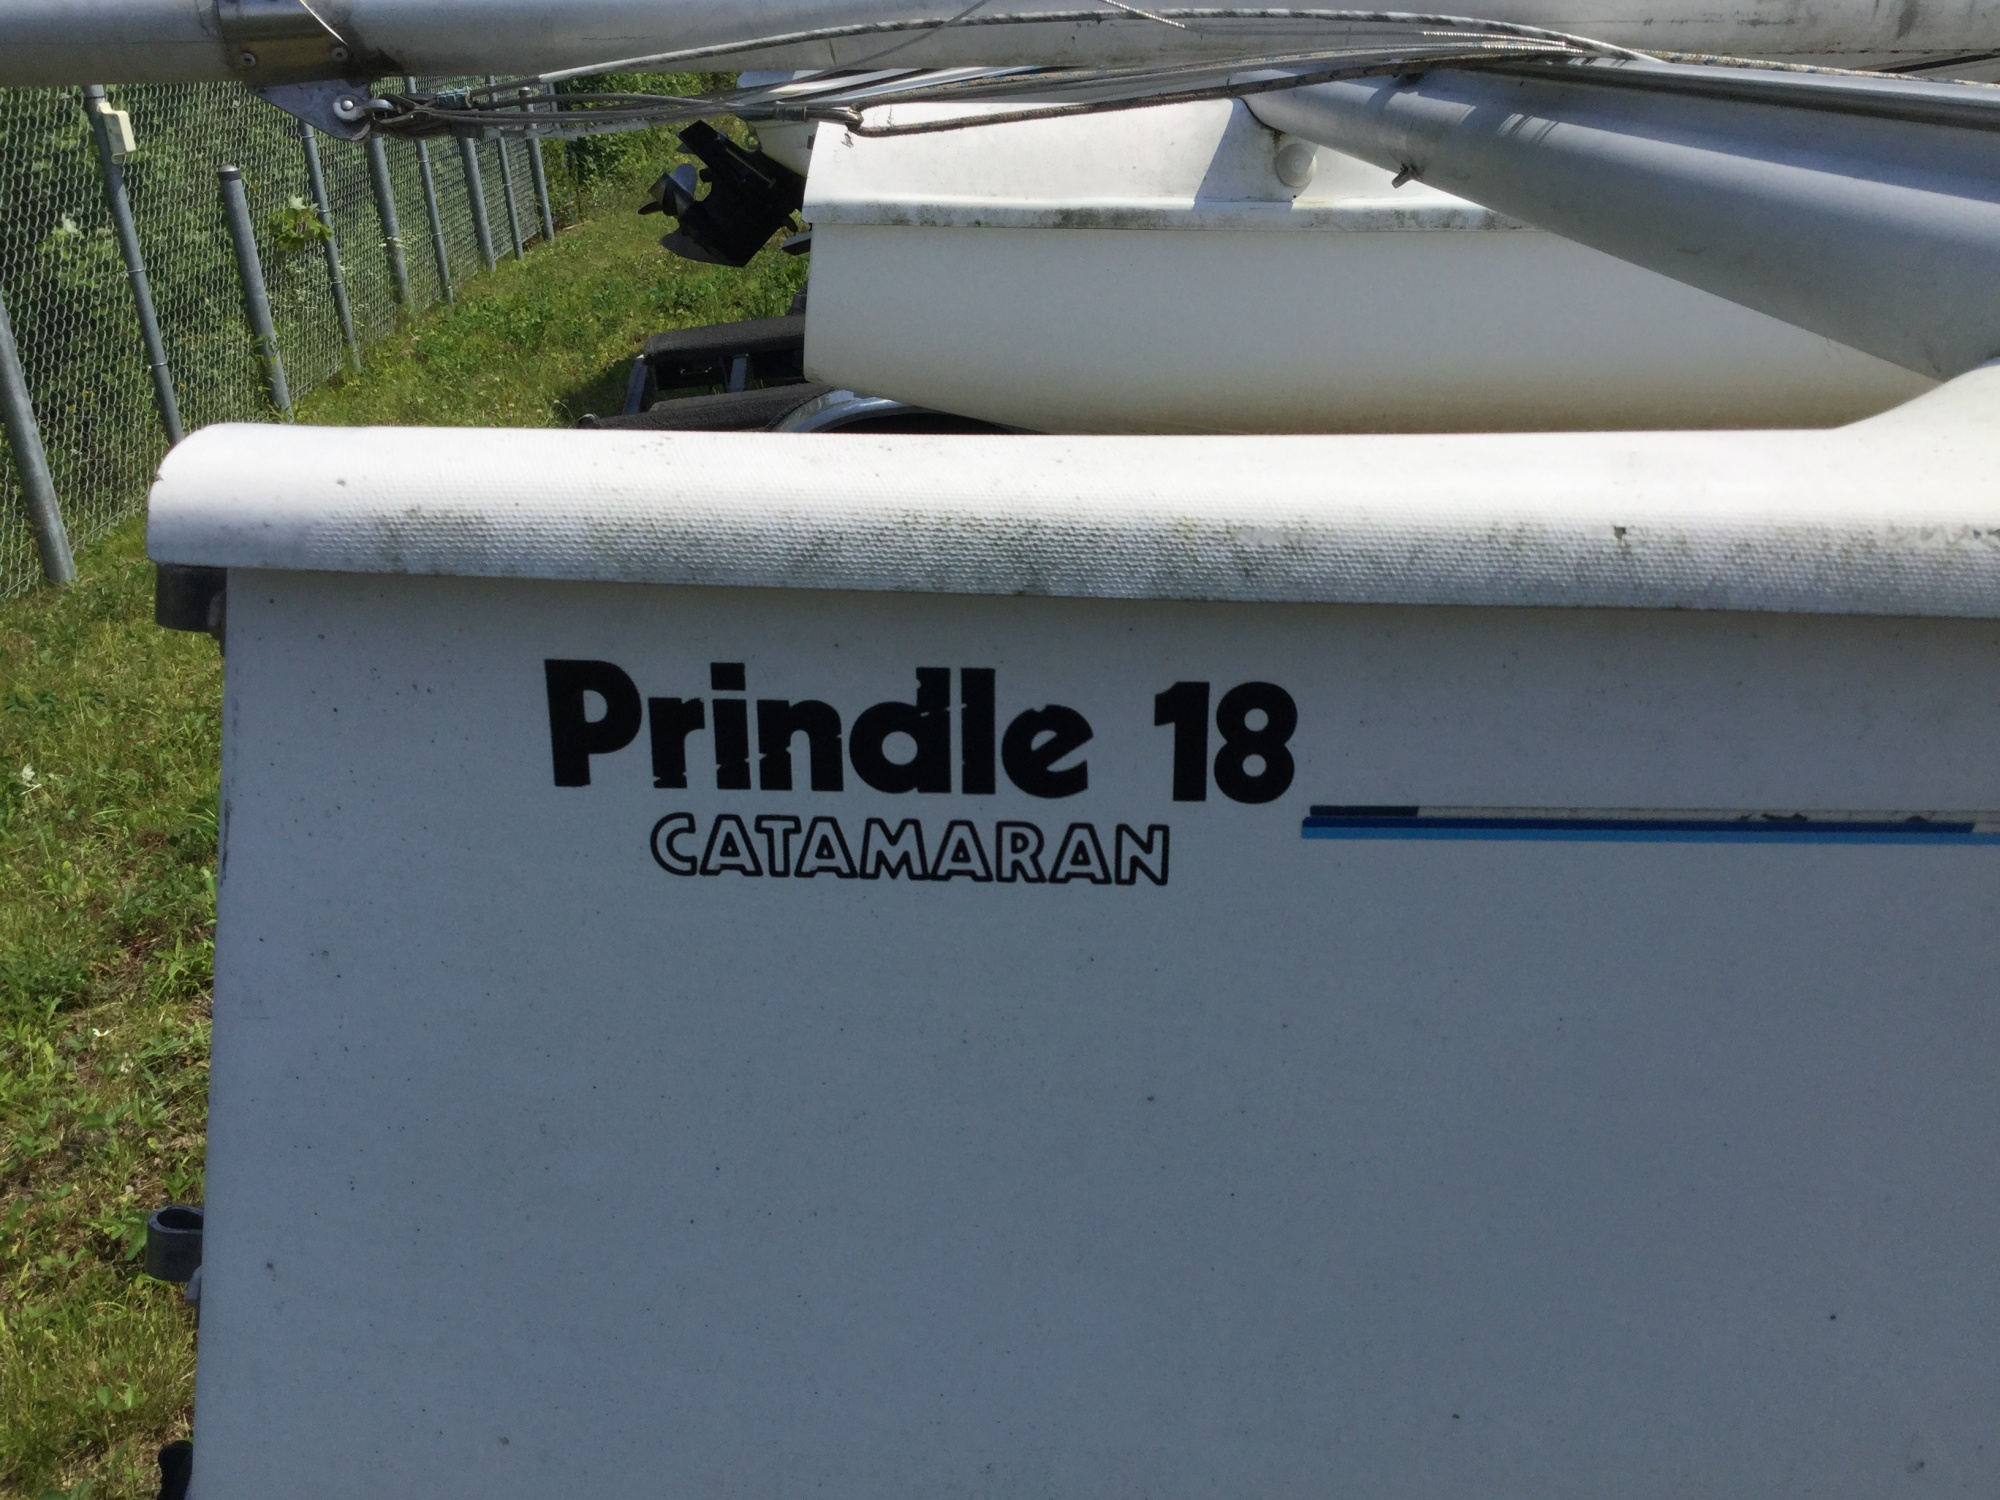 Prindle 18 - image.jpeg